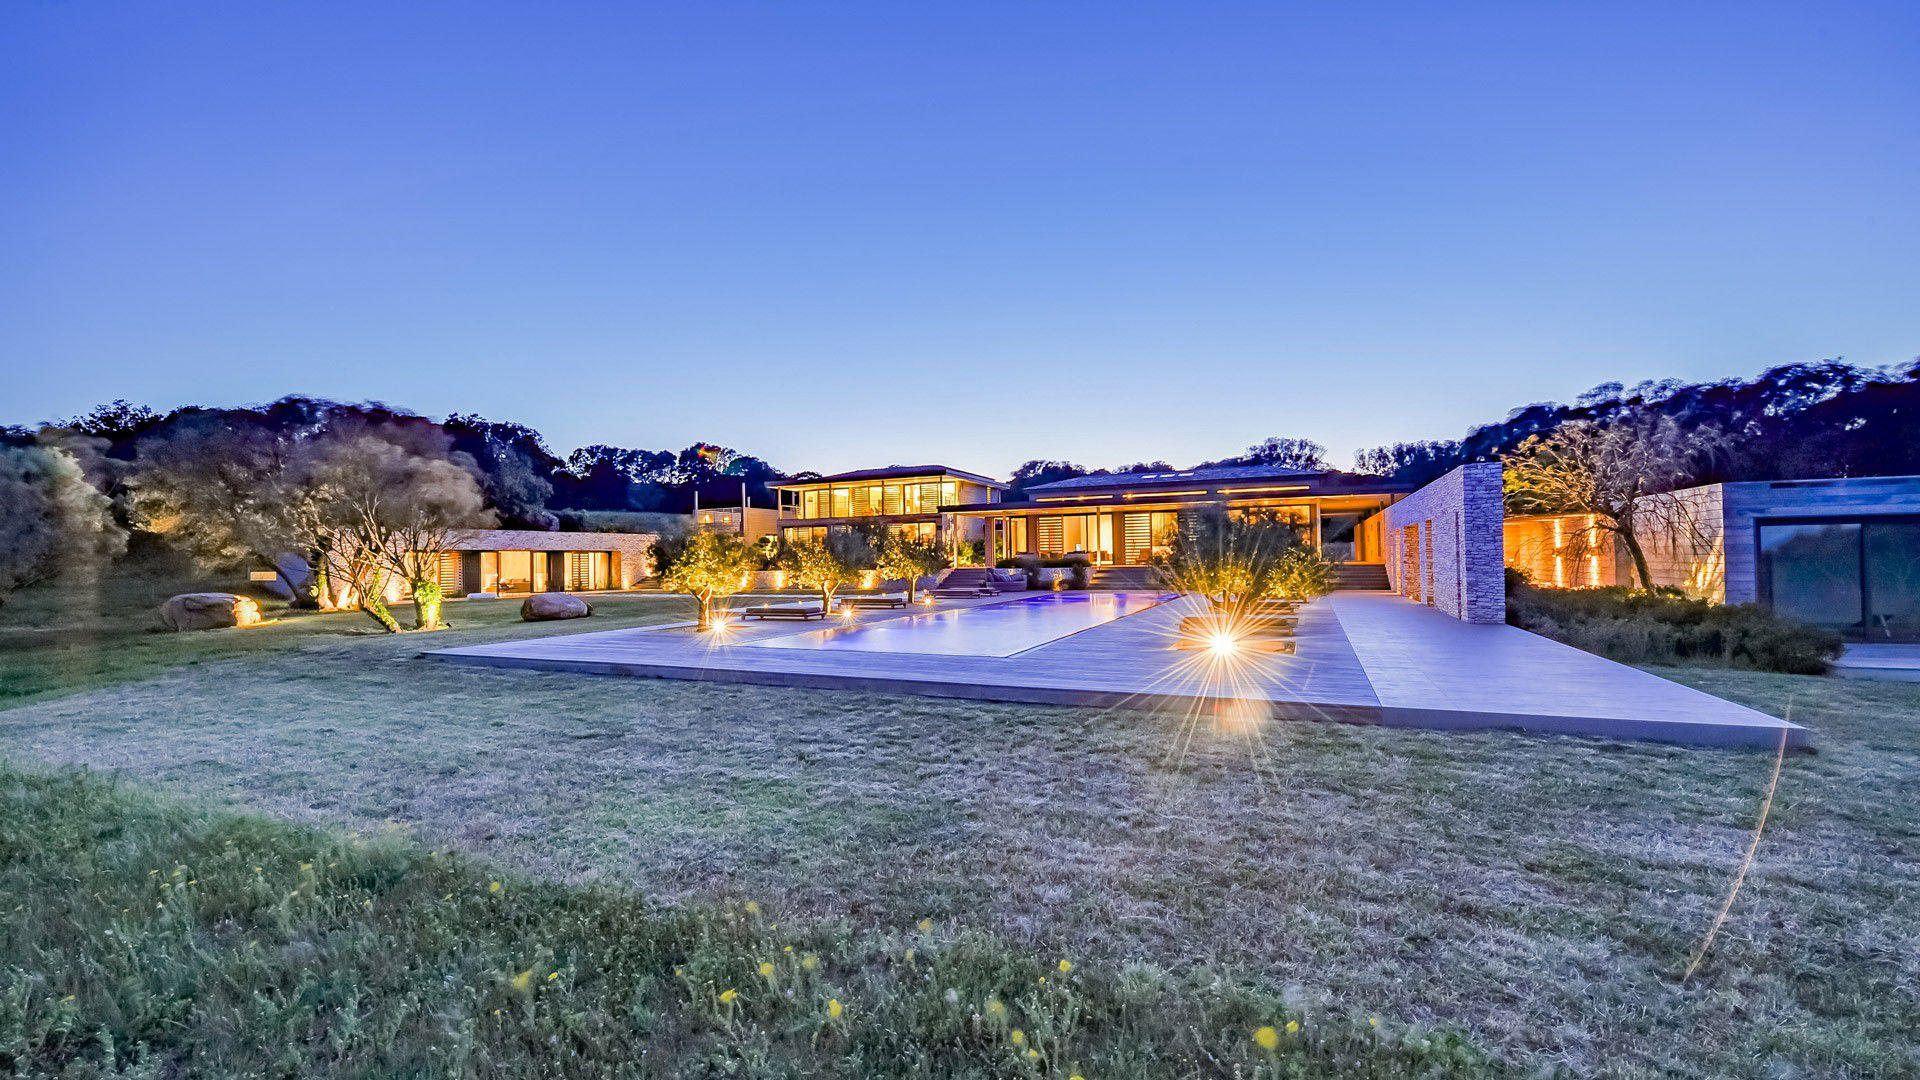 Villa Terre Du Sud immobilier de luxe en corse : porto vecchio, bonifacio, cala